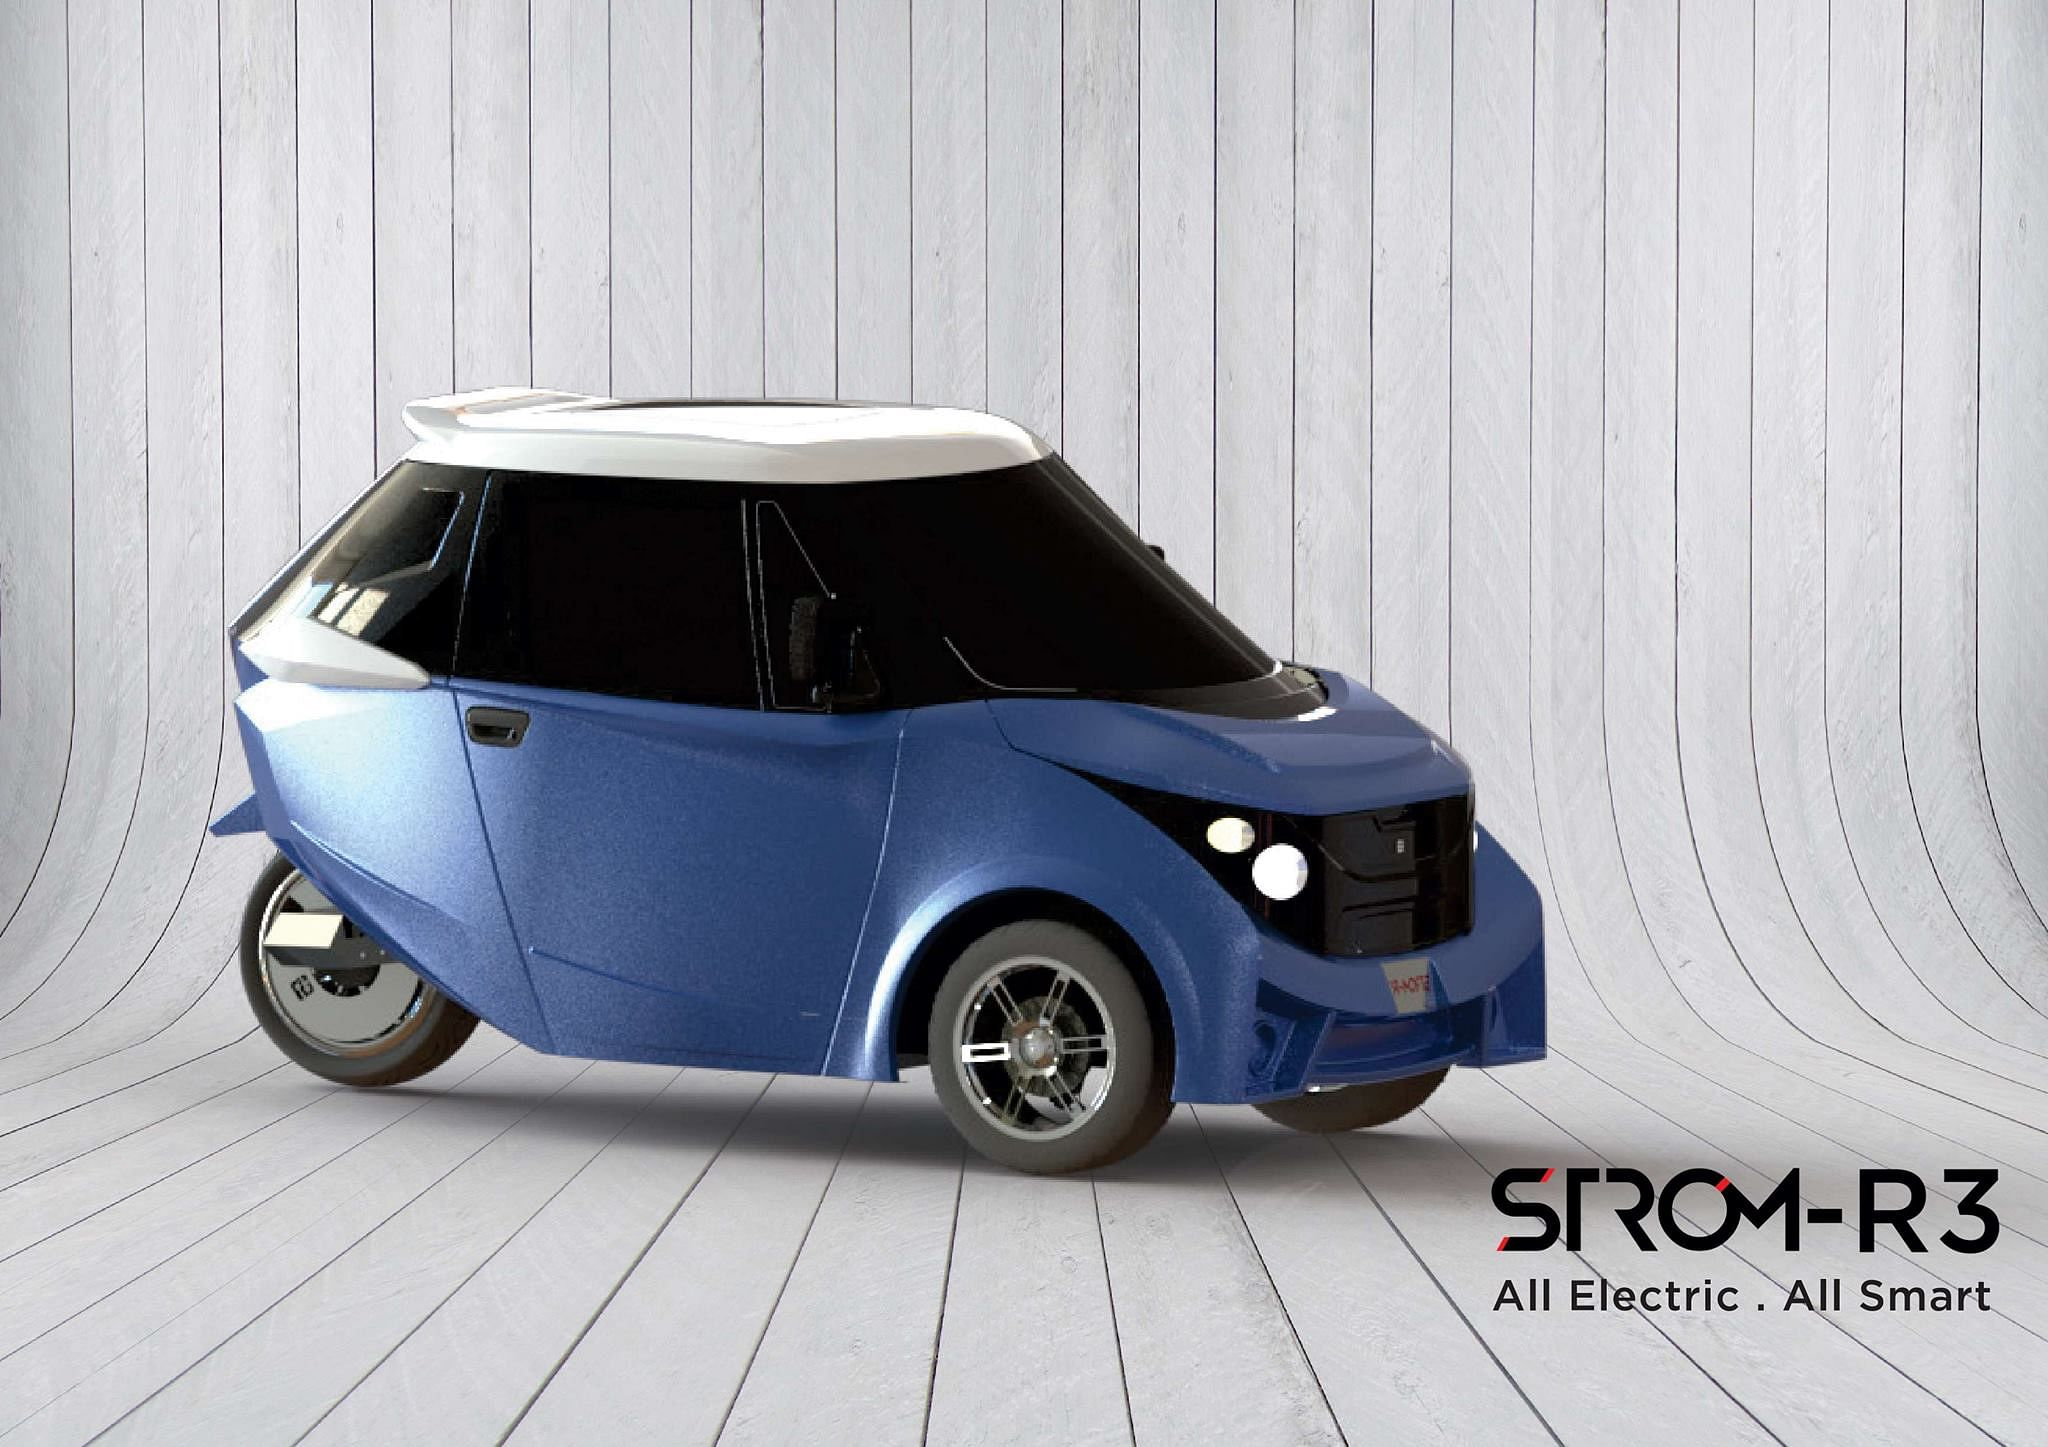 Strom R-3 (Source: Facebook/Strom Motors)